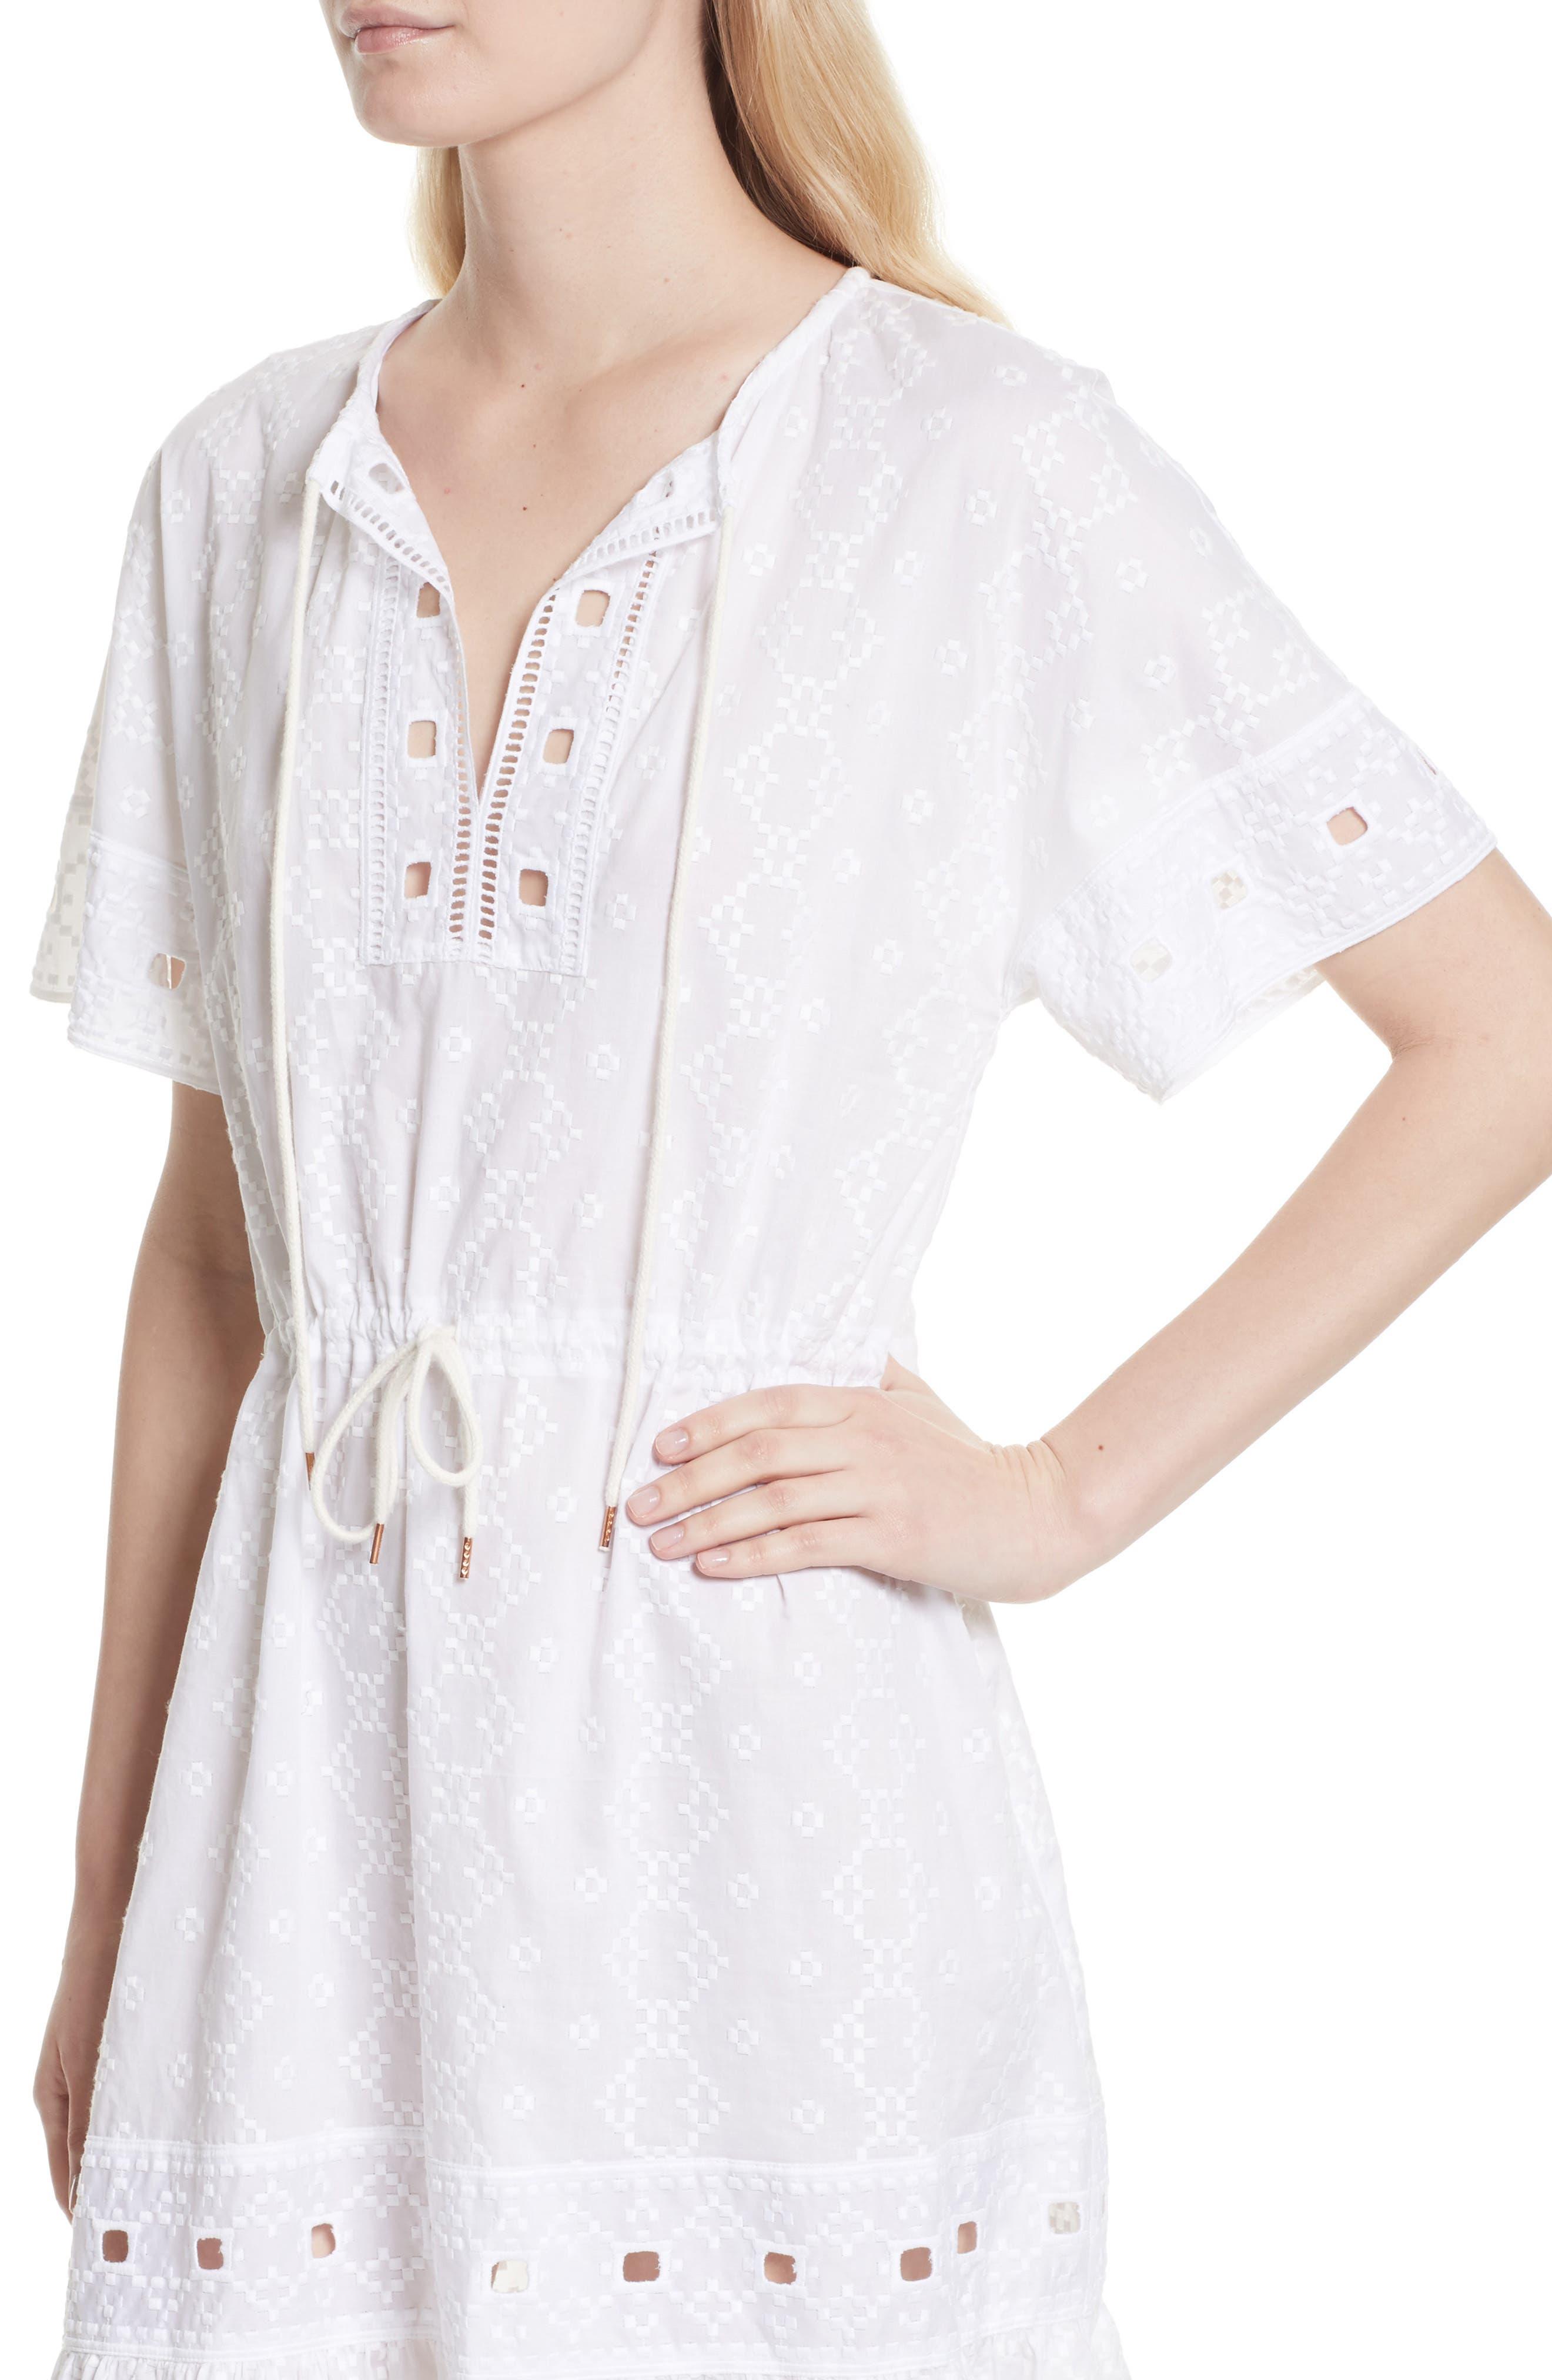 Cotton Eyelet Dress,                             Alternate thumbnail 4, color,                             101